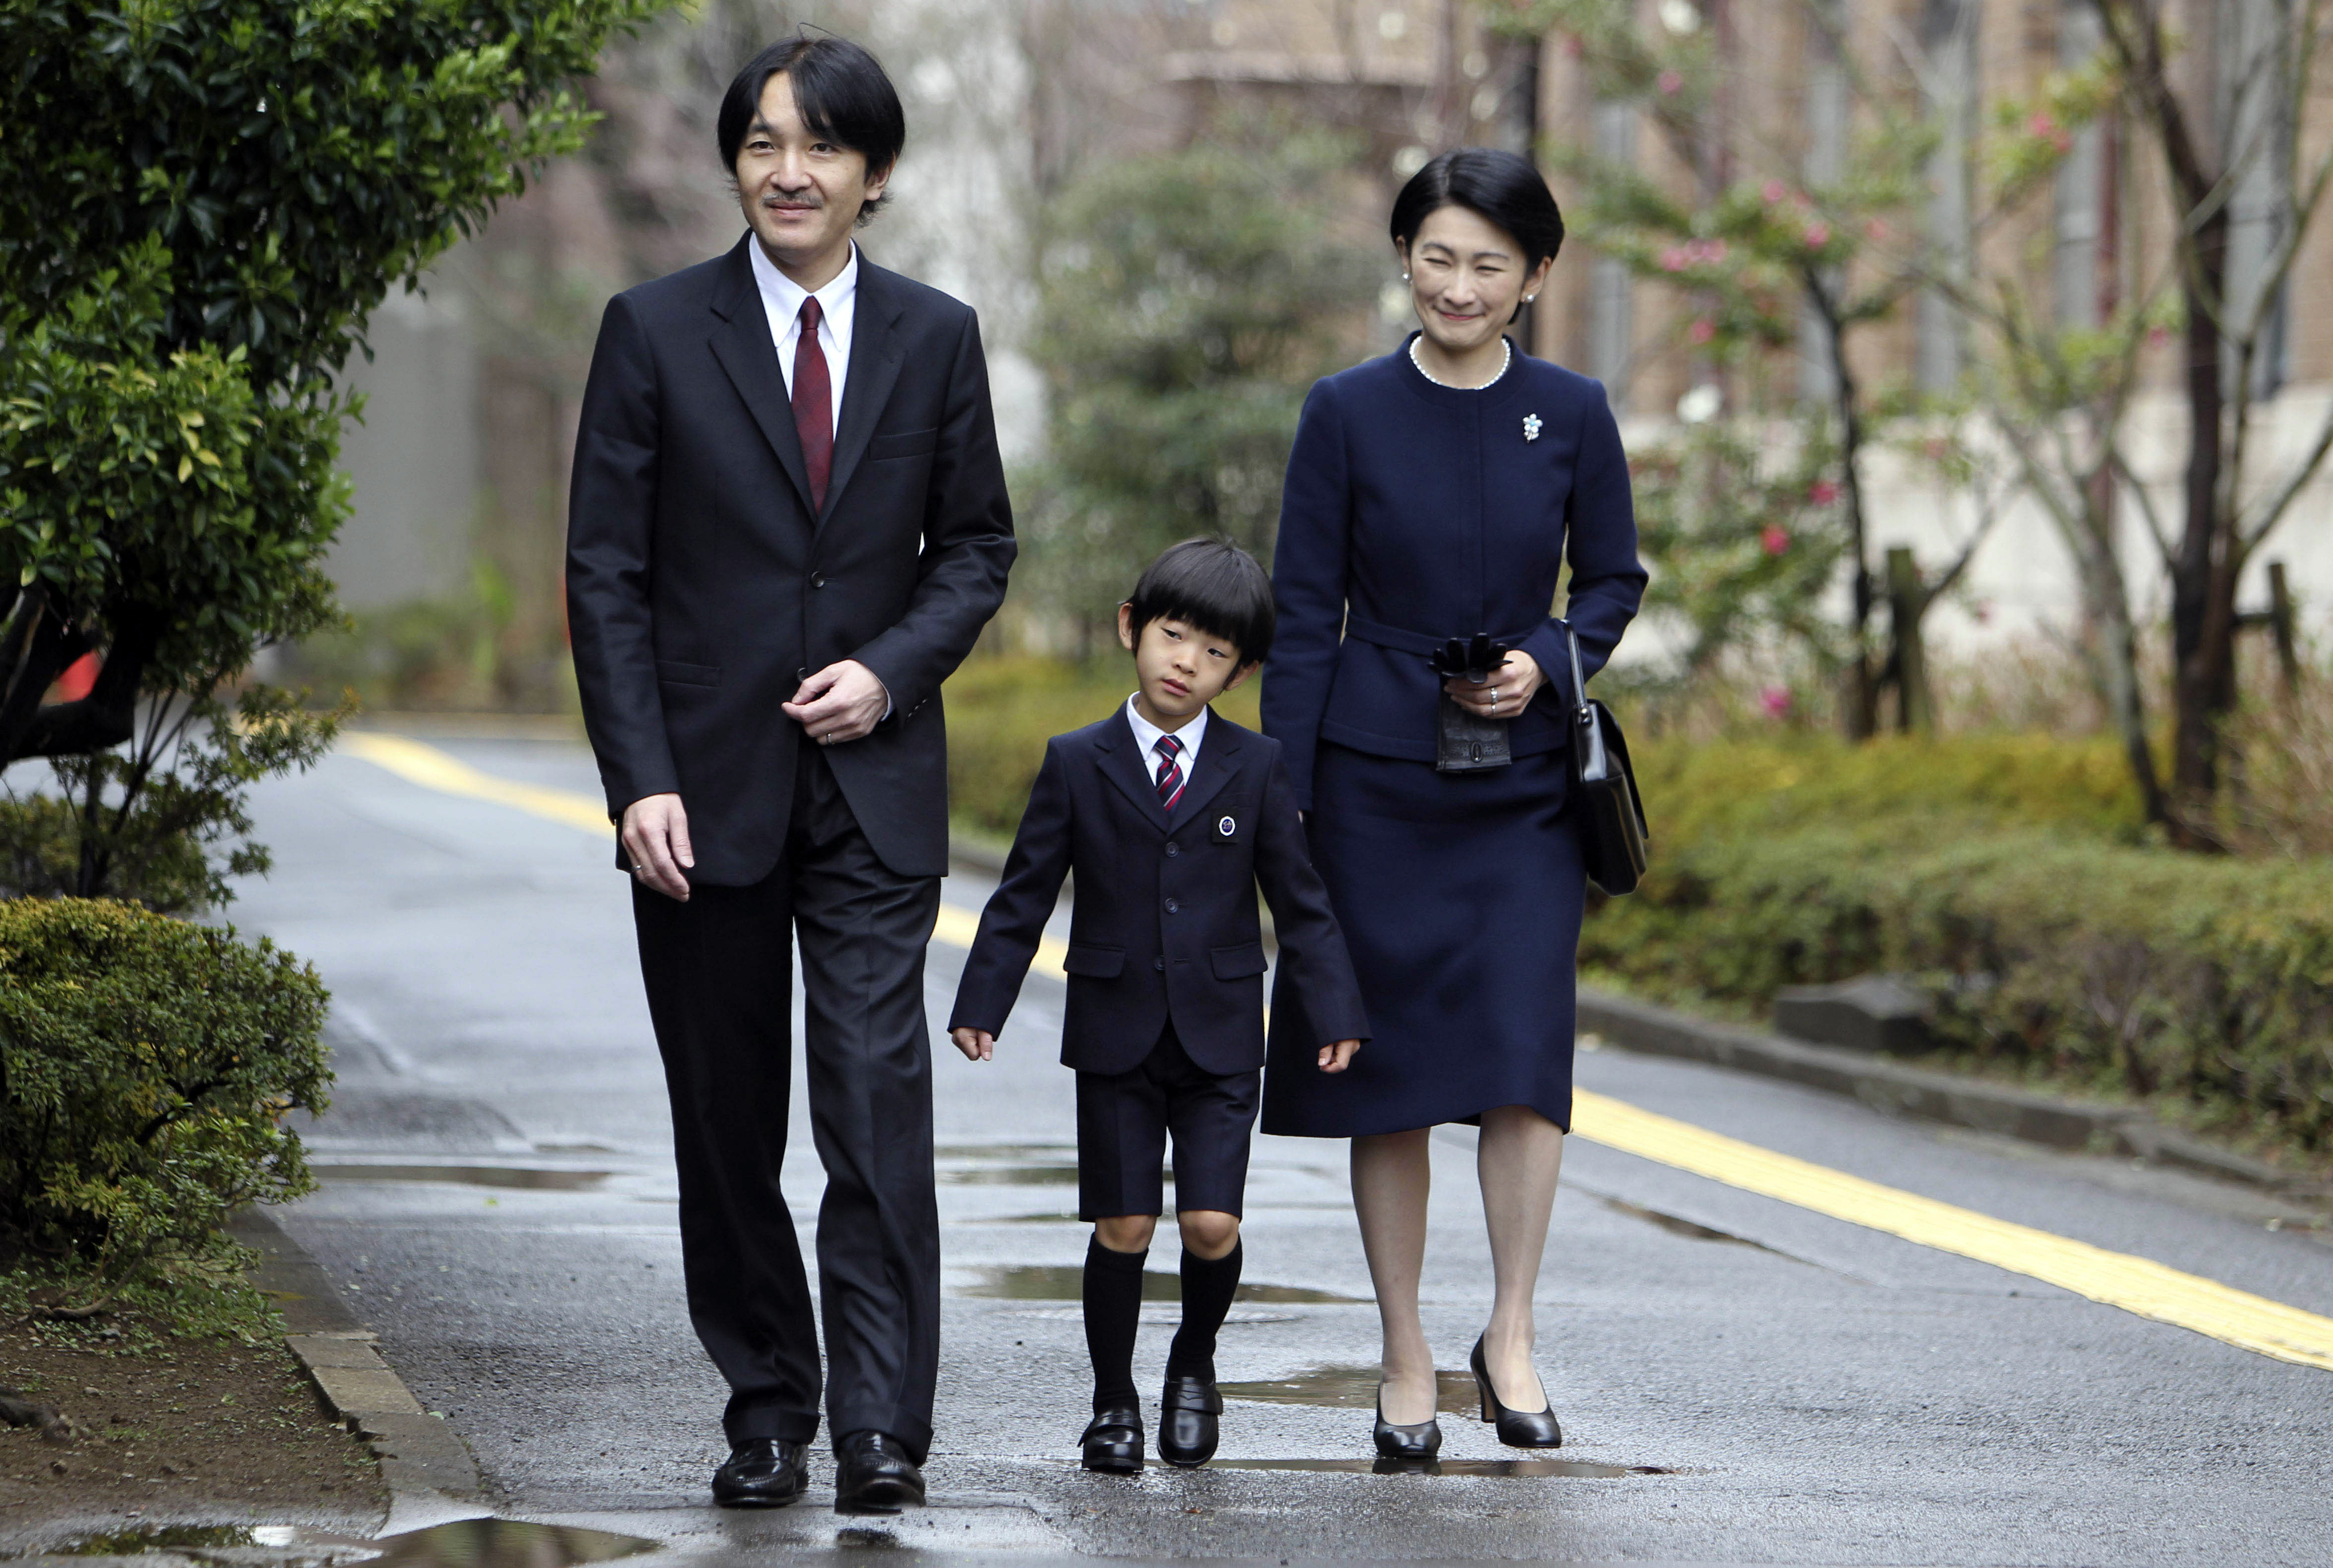 Japan's Prince Hisahito (C), accompanied  by his father Prince Akishino (L) and mother Princess Kiko, arrives at Ochanomizu University affiliated kindergarten for his graduation ceremony in Tokyo on March 14, 2013.      (JUNJI KUROKAWA/AFP/Getty Images)